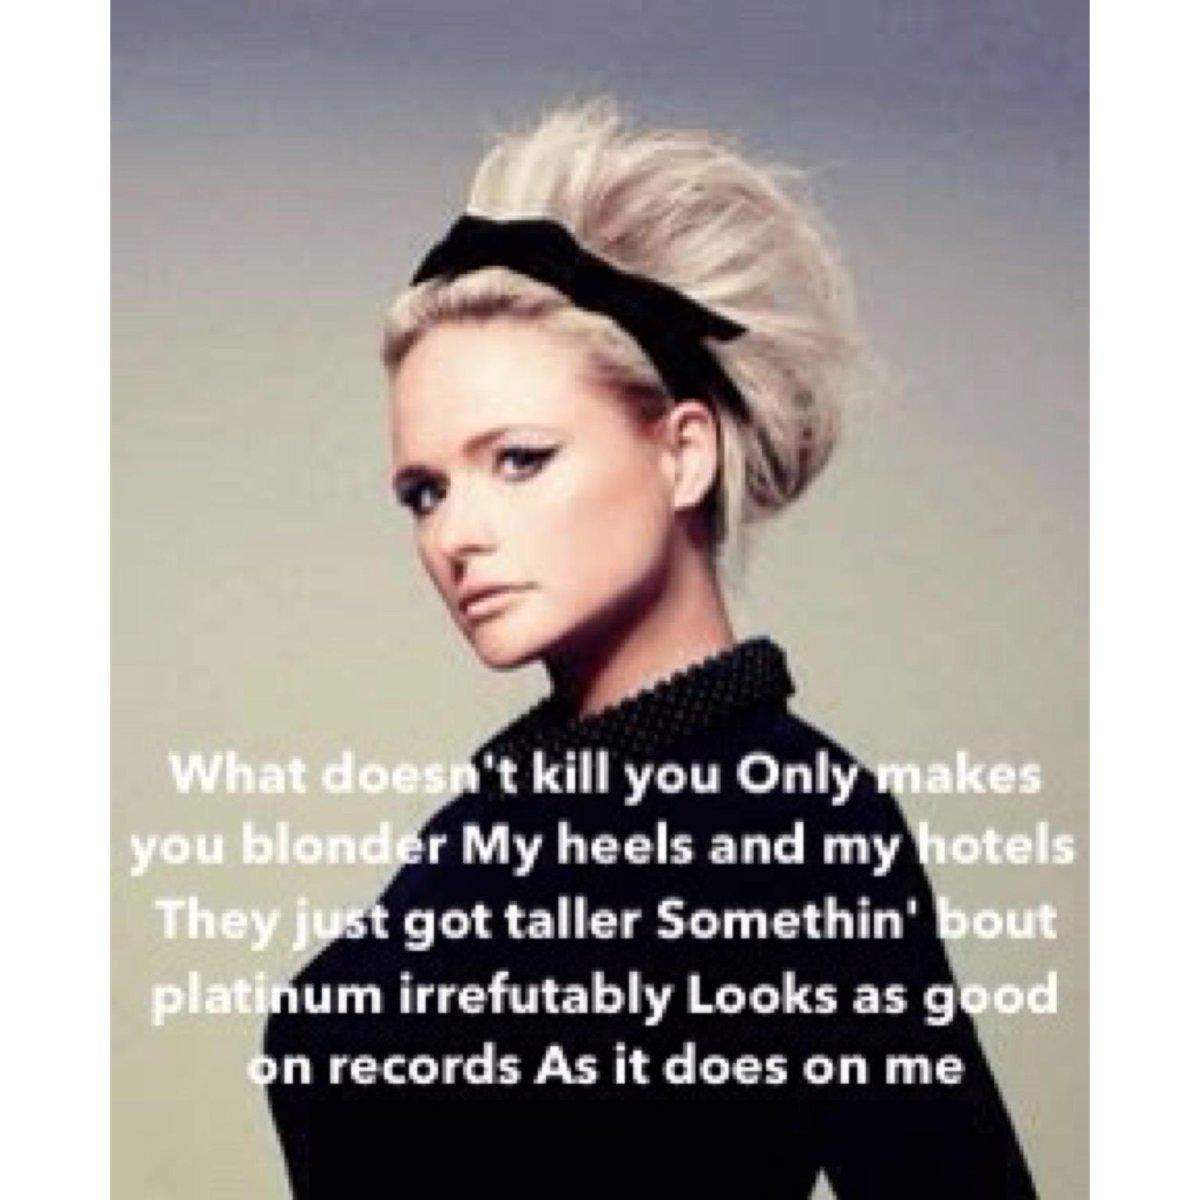 Listening to some kick ass country from @mirandalambert - miss ya girl, have fun tomorrow! #blondessticktogether